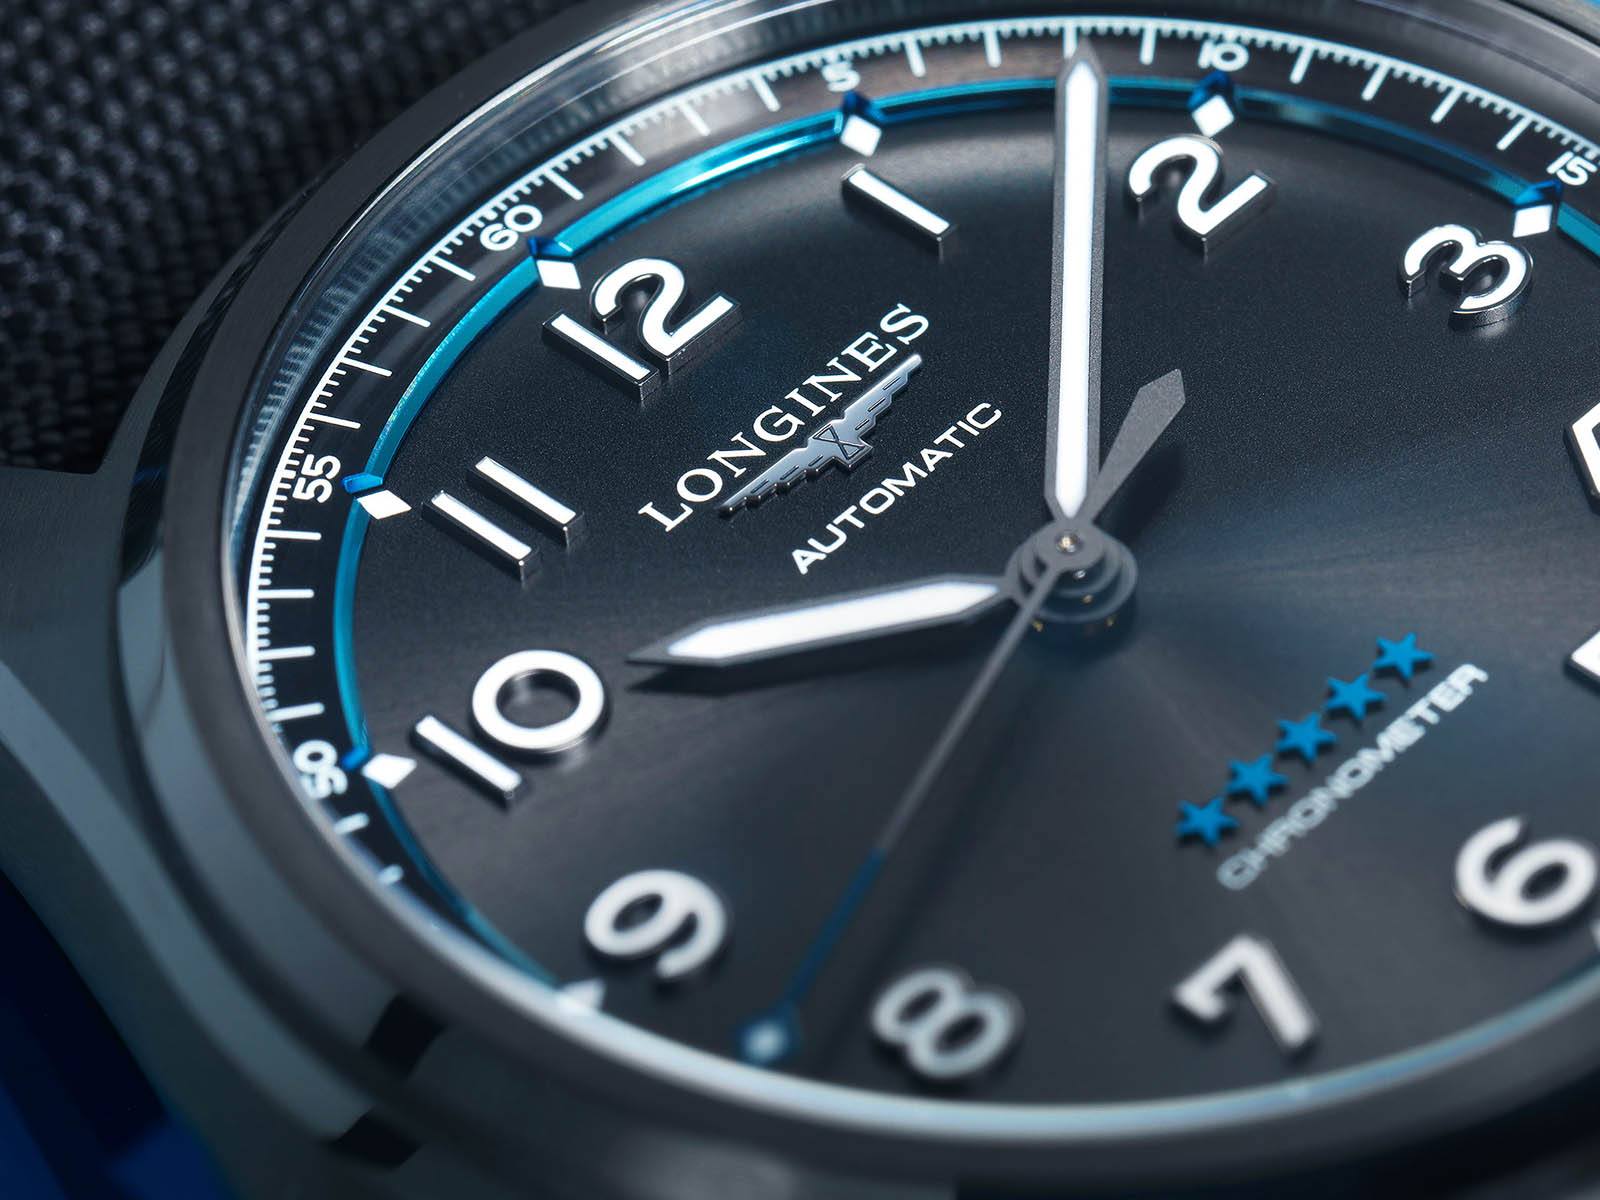 l3-810-2-99-2-longines-spirit-bucherer-blue-automatic-2.jpg